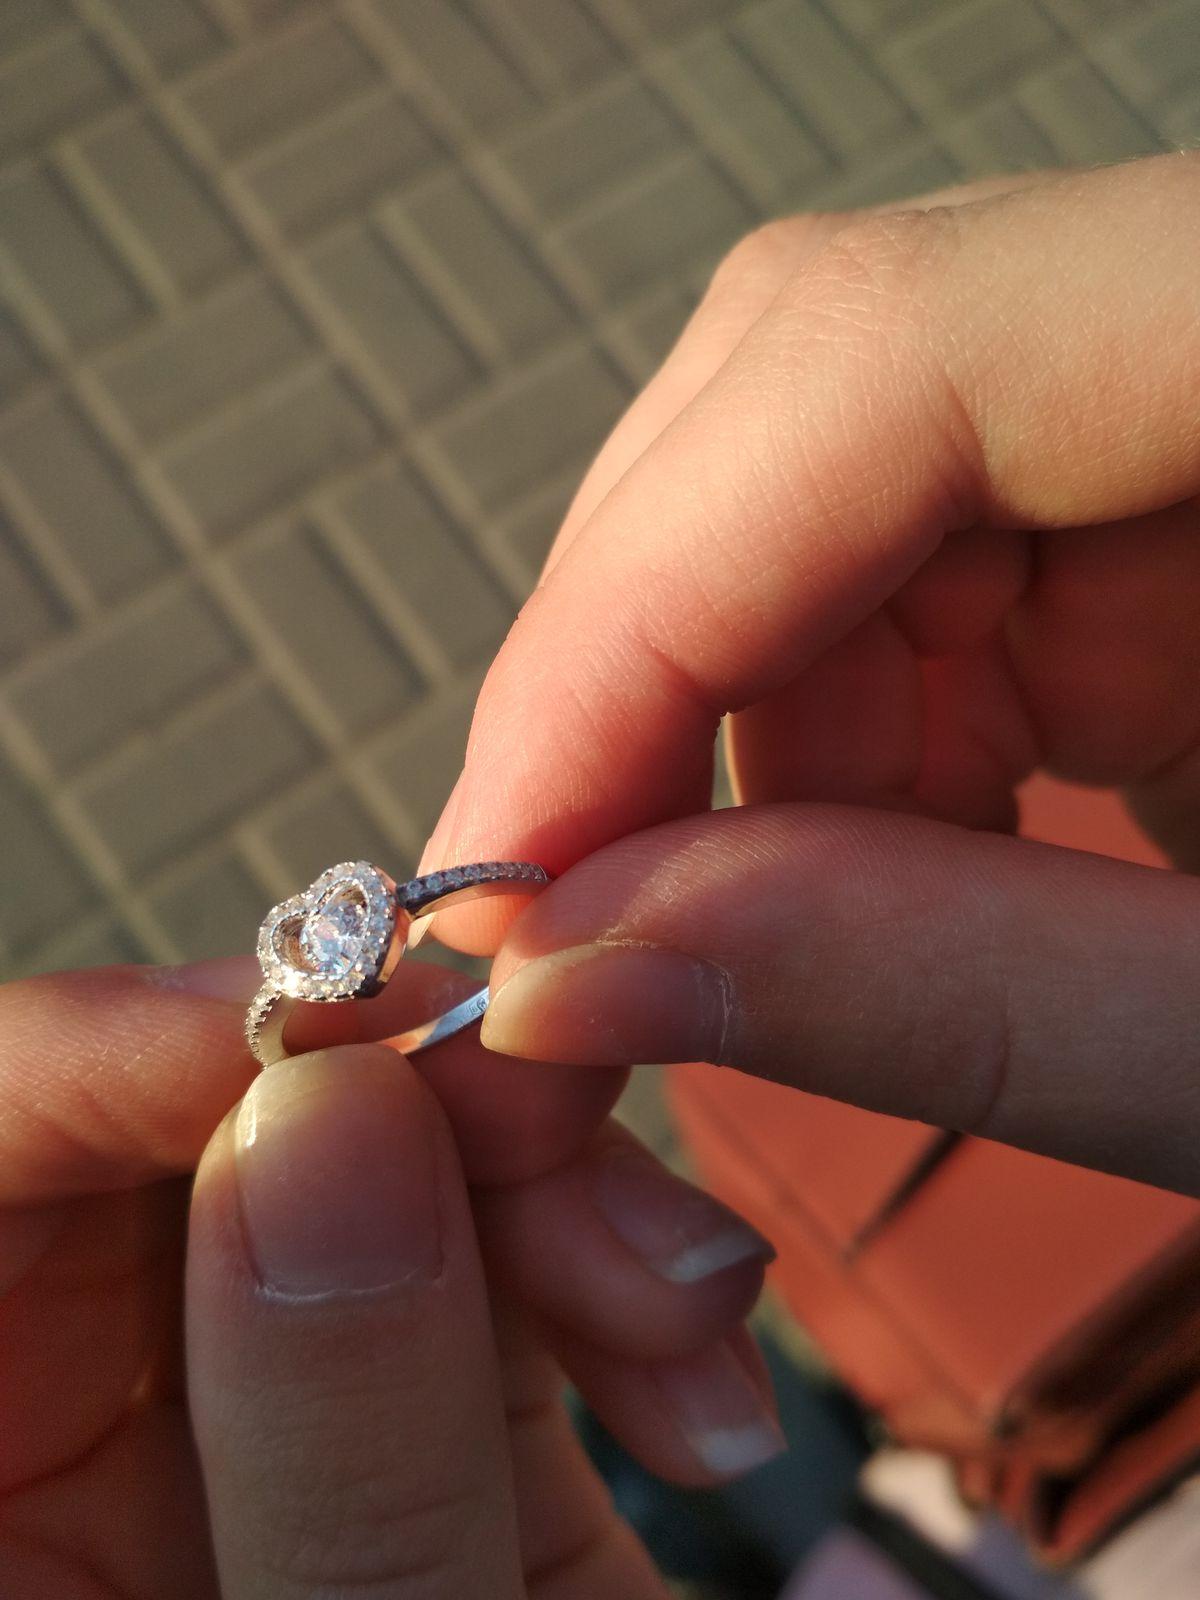 Красивое кольцо 😍